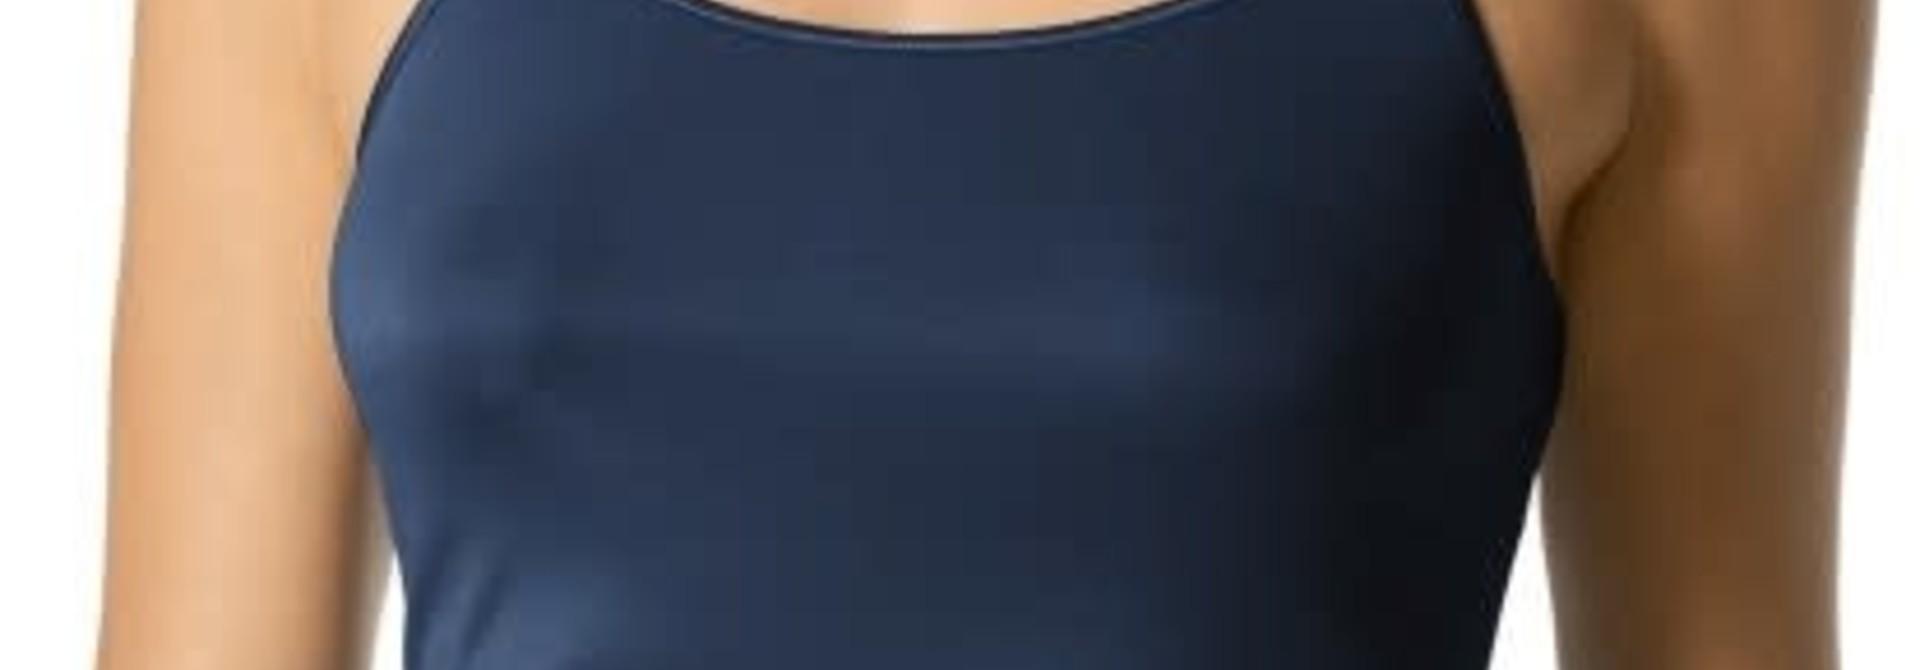 Spaghetti Top Emotion 55201 - atlantic blue mt. 38